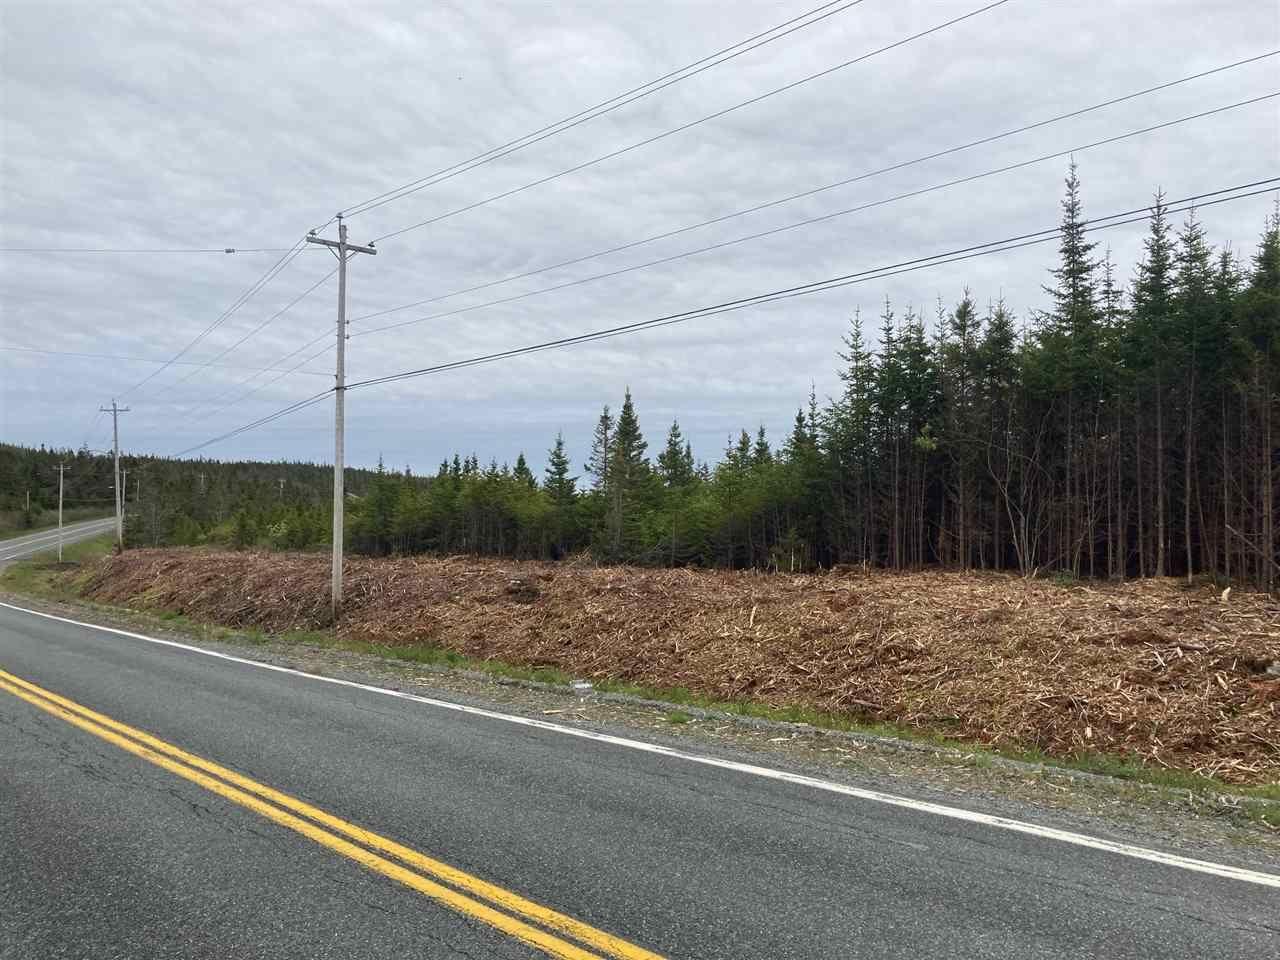 Photo 7: Photos: 1405 Highway 7 in Marie Joseph: 303-Guysborough County Vacant Land for sale (Highland Region)  : MLS®# 202010345